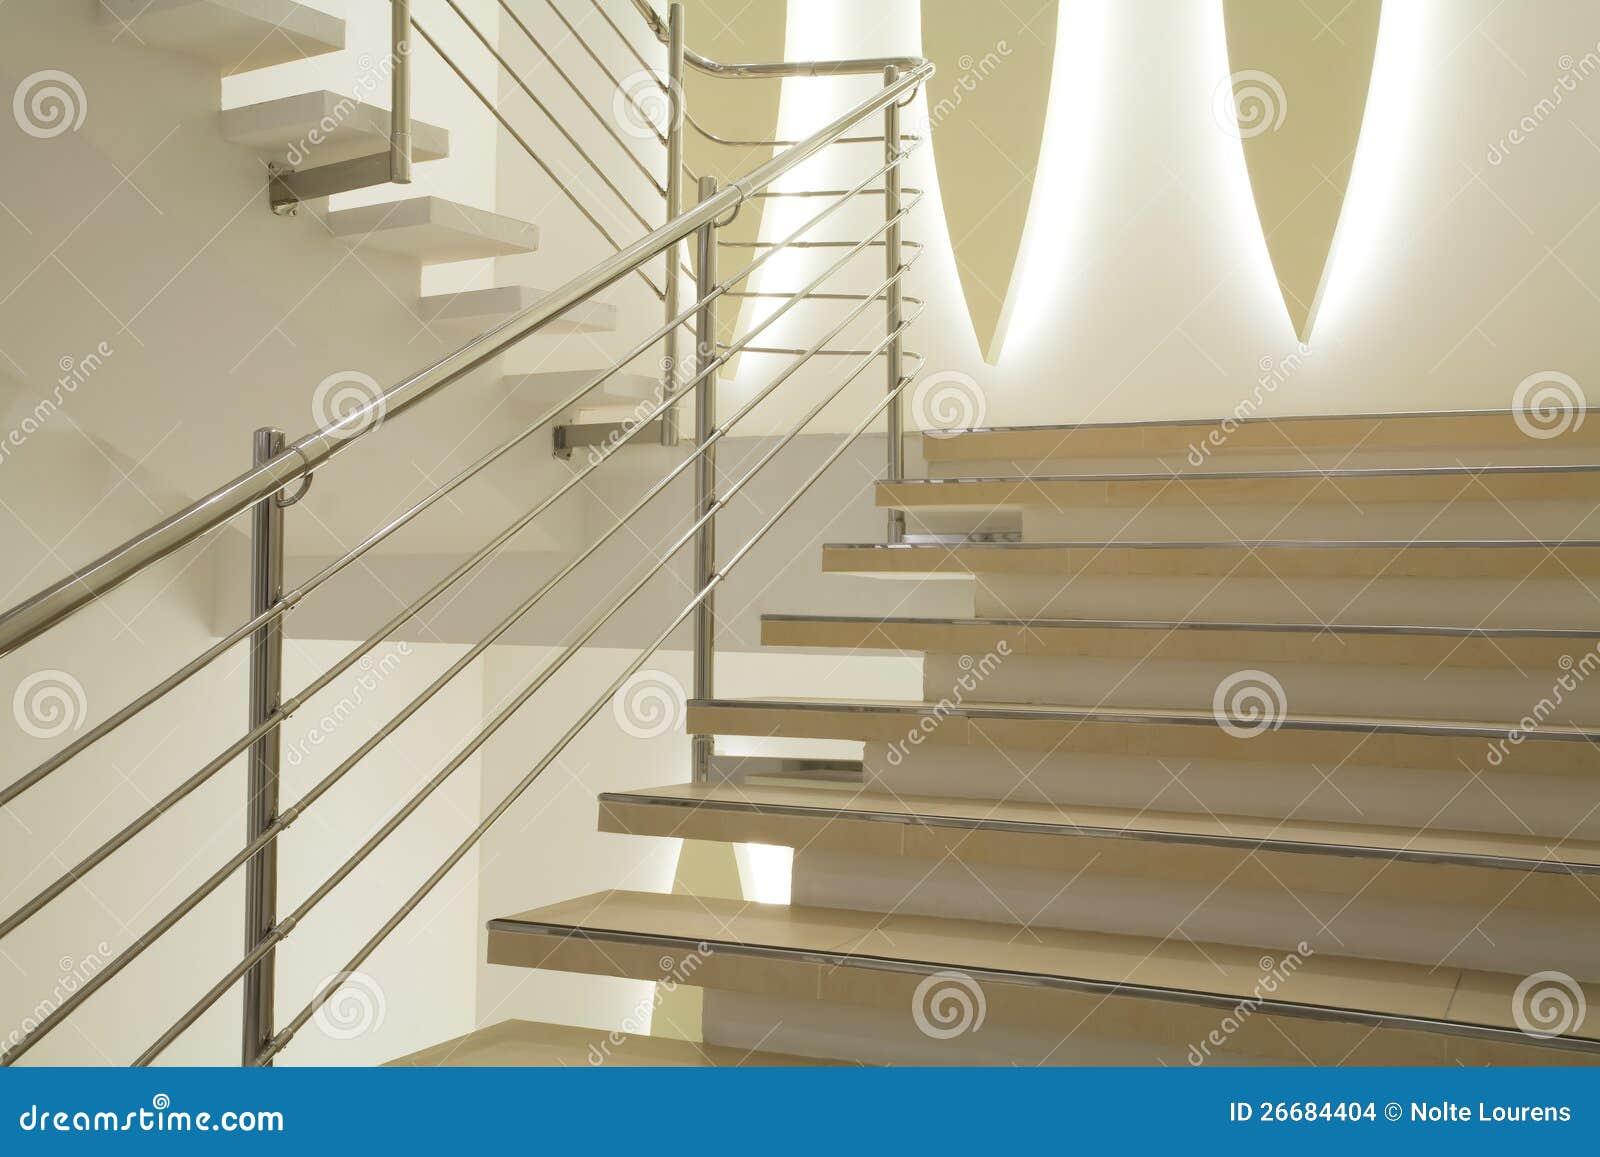 Escaleras ligeras imagenes de archivo imagen 26684404 for Escaleras ligeras